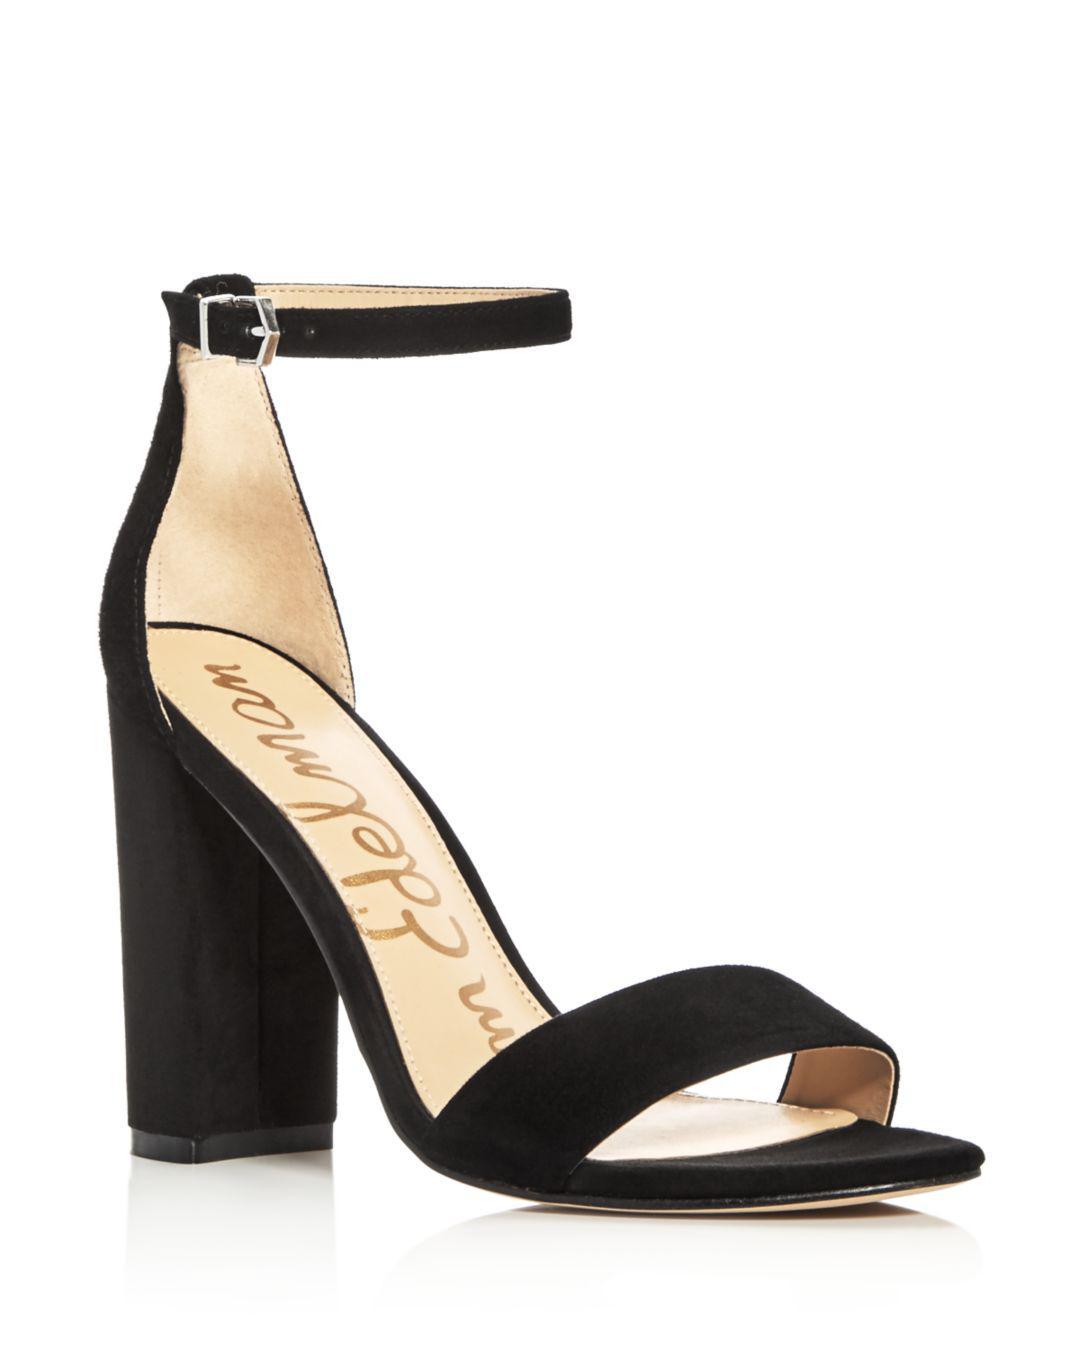 1b38b8a113e Sam Edelman. Women s Yaro Ankle Strap Block Heel Sandals